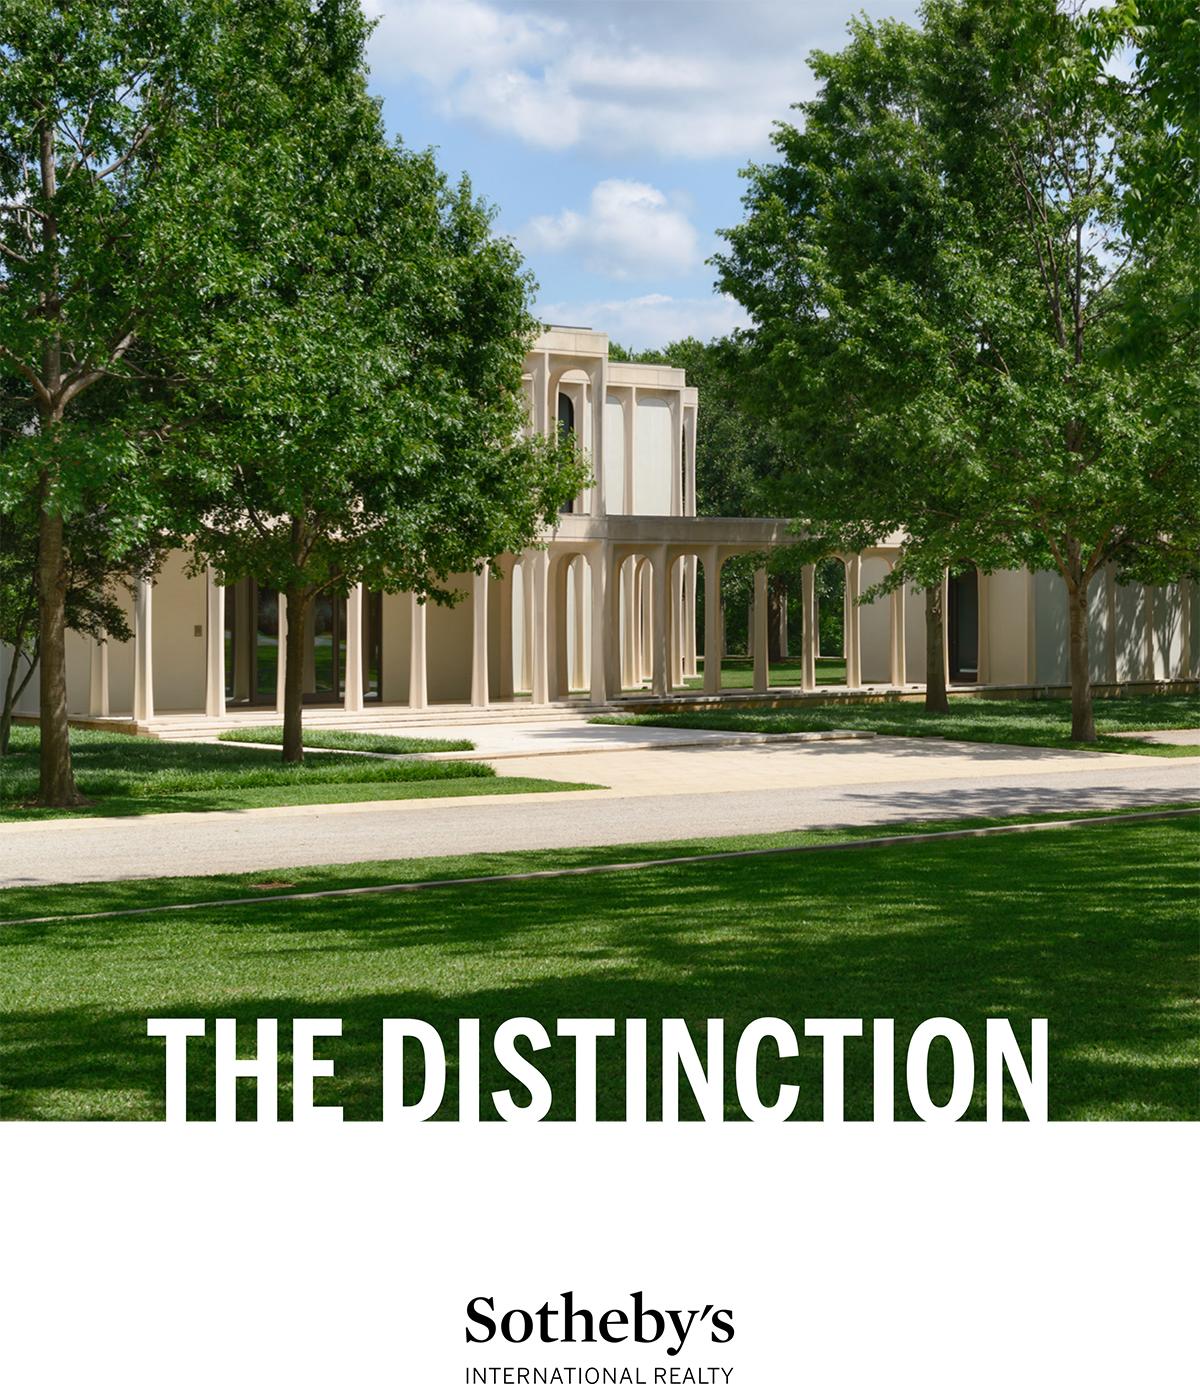 The_Distinction.pdf